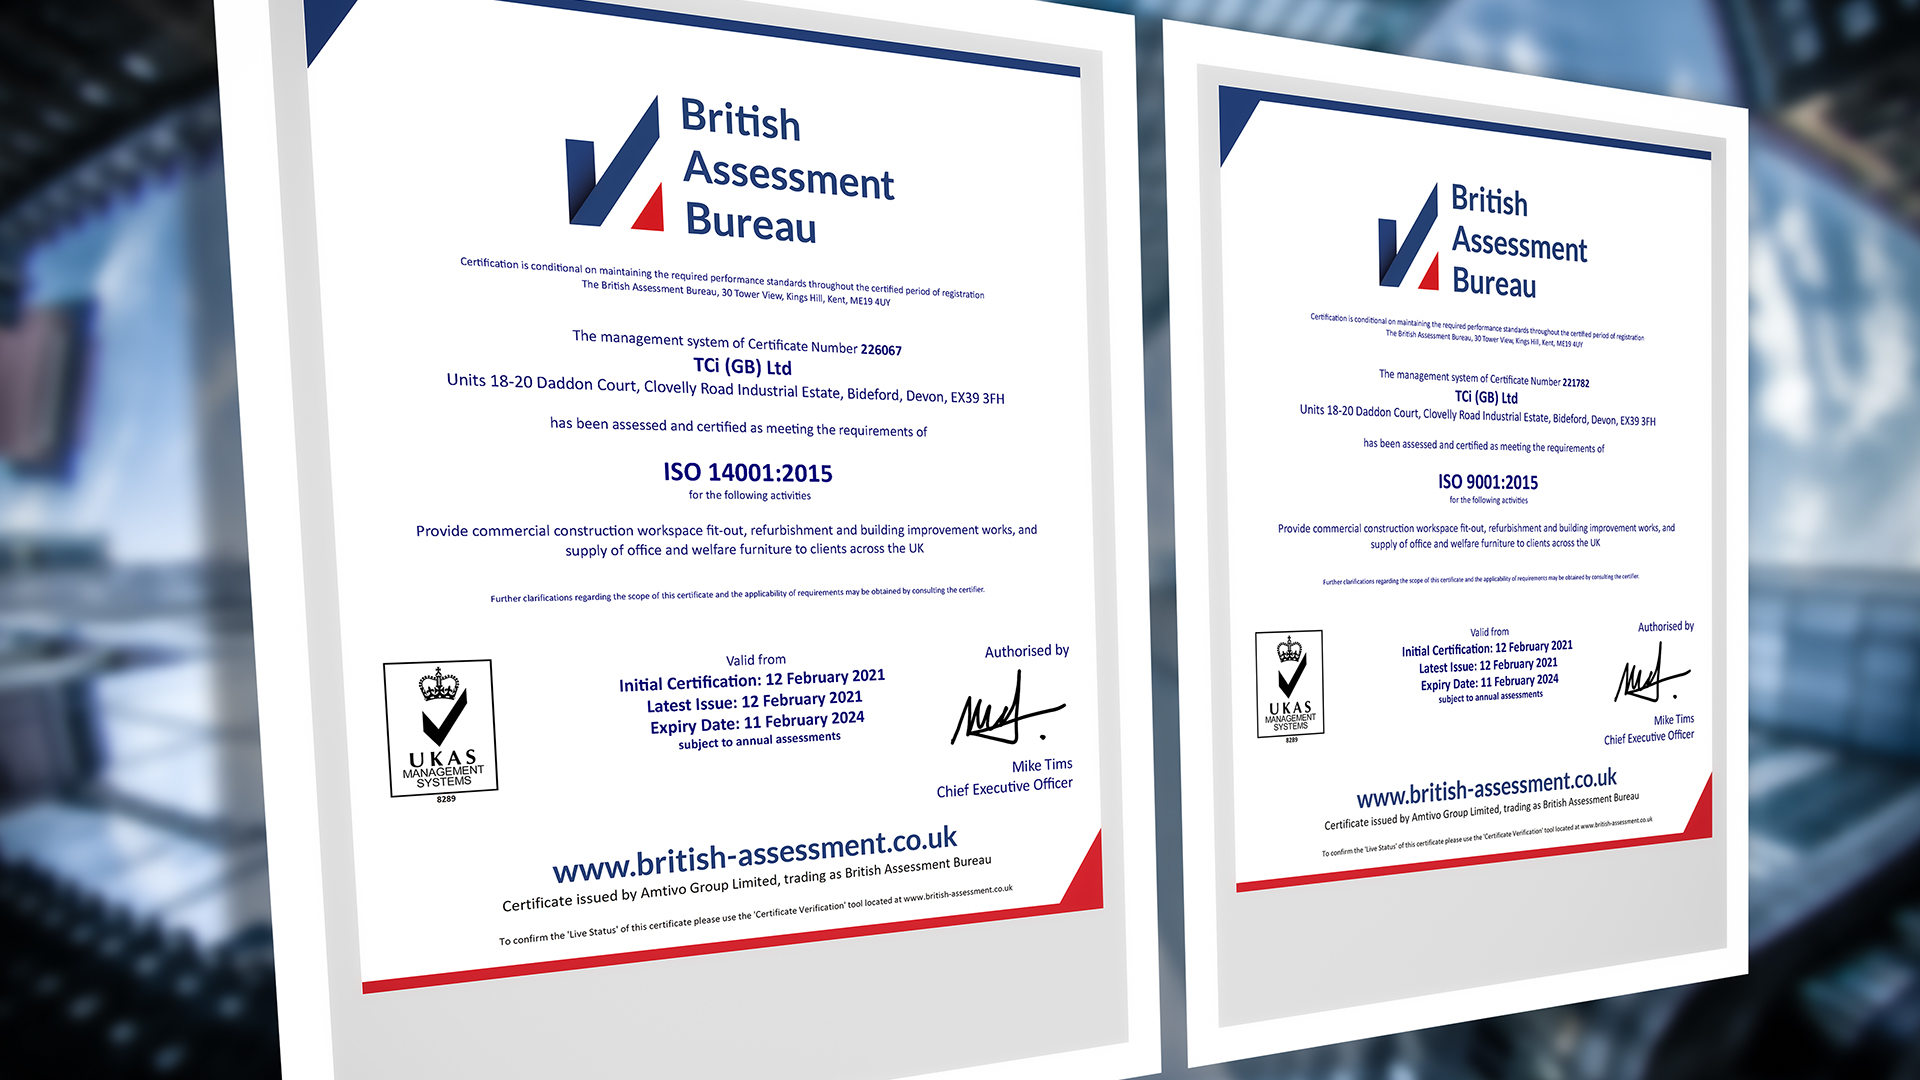 UKAS ISO 9001 & 14001 Standards